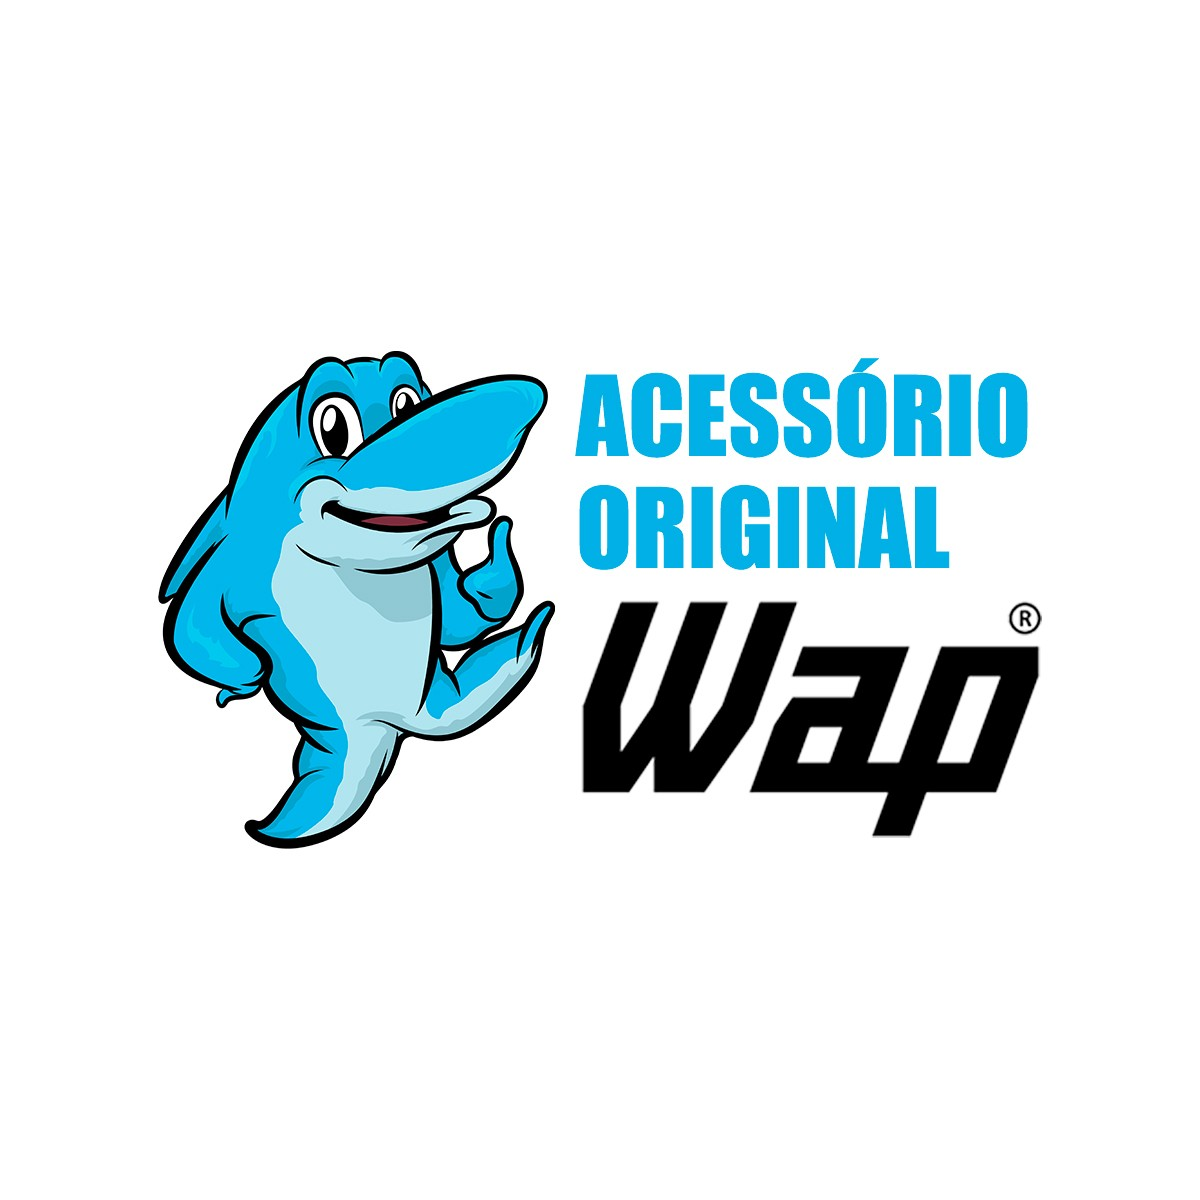 Saco Descartável Original Wap para Aspirador GTW Inox 50